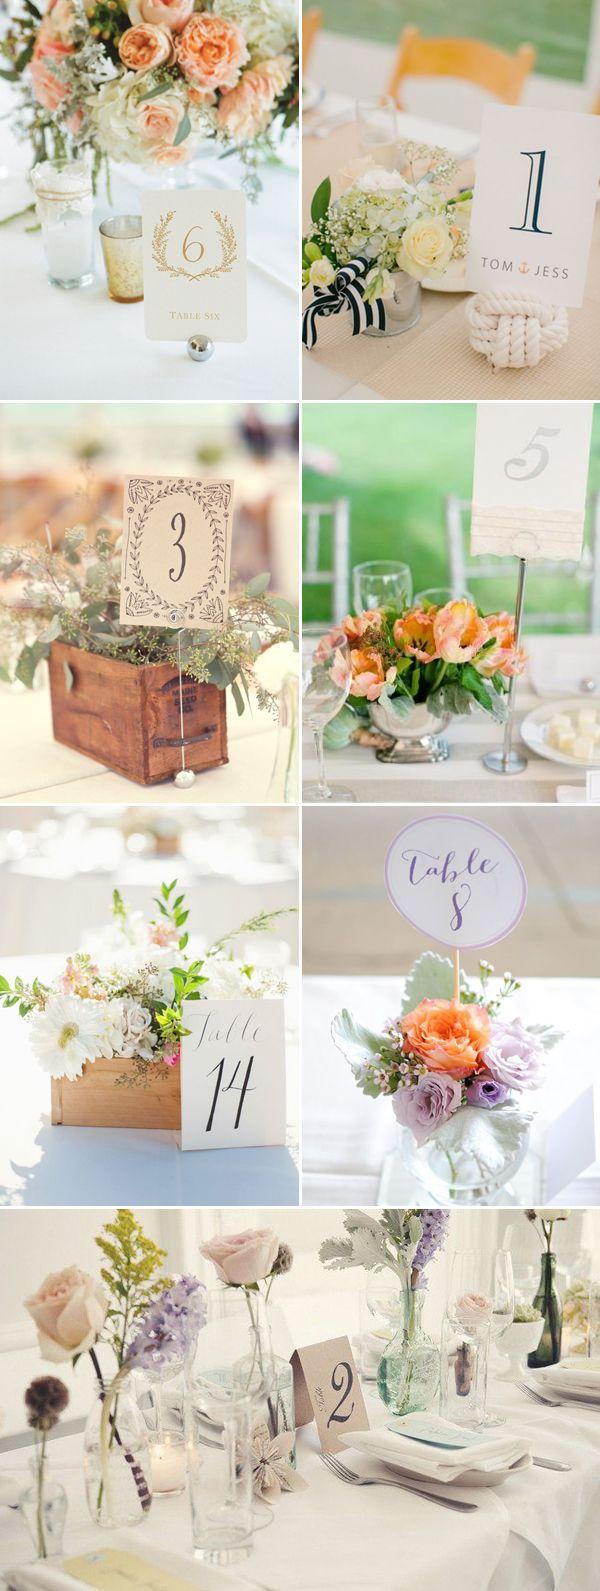 43 Creative DIY Wedding Table Number Ideas | Diy wedding table ...